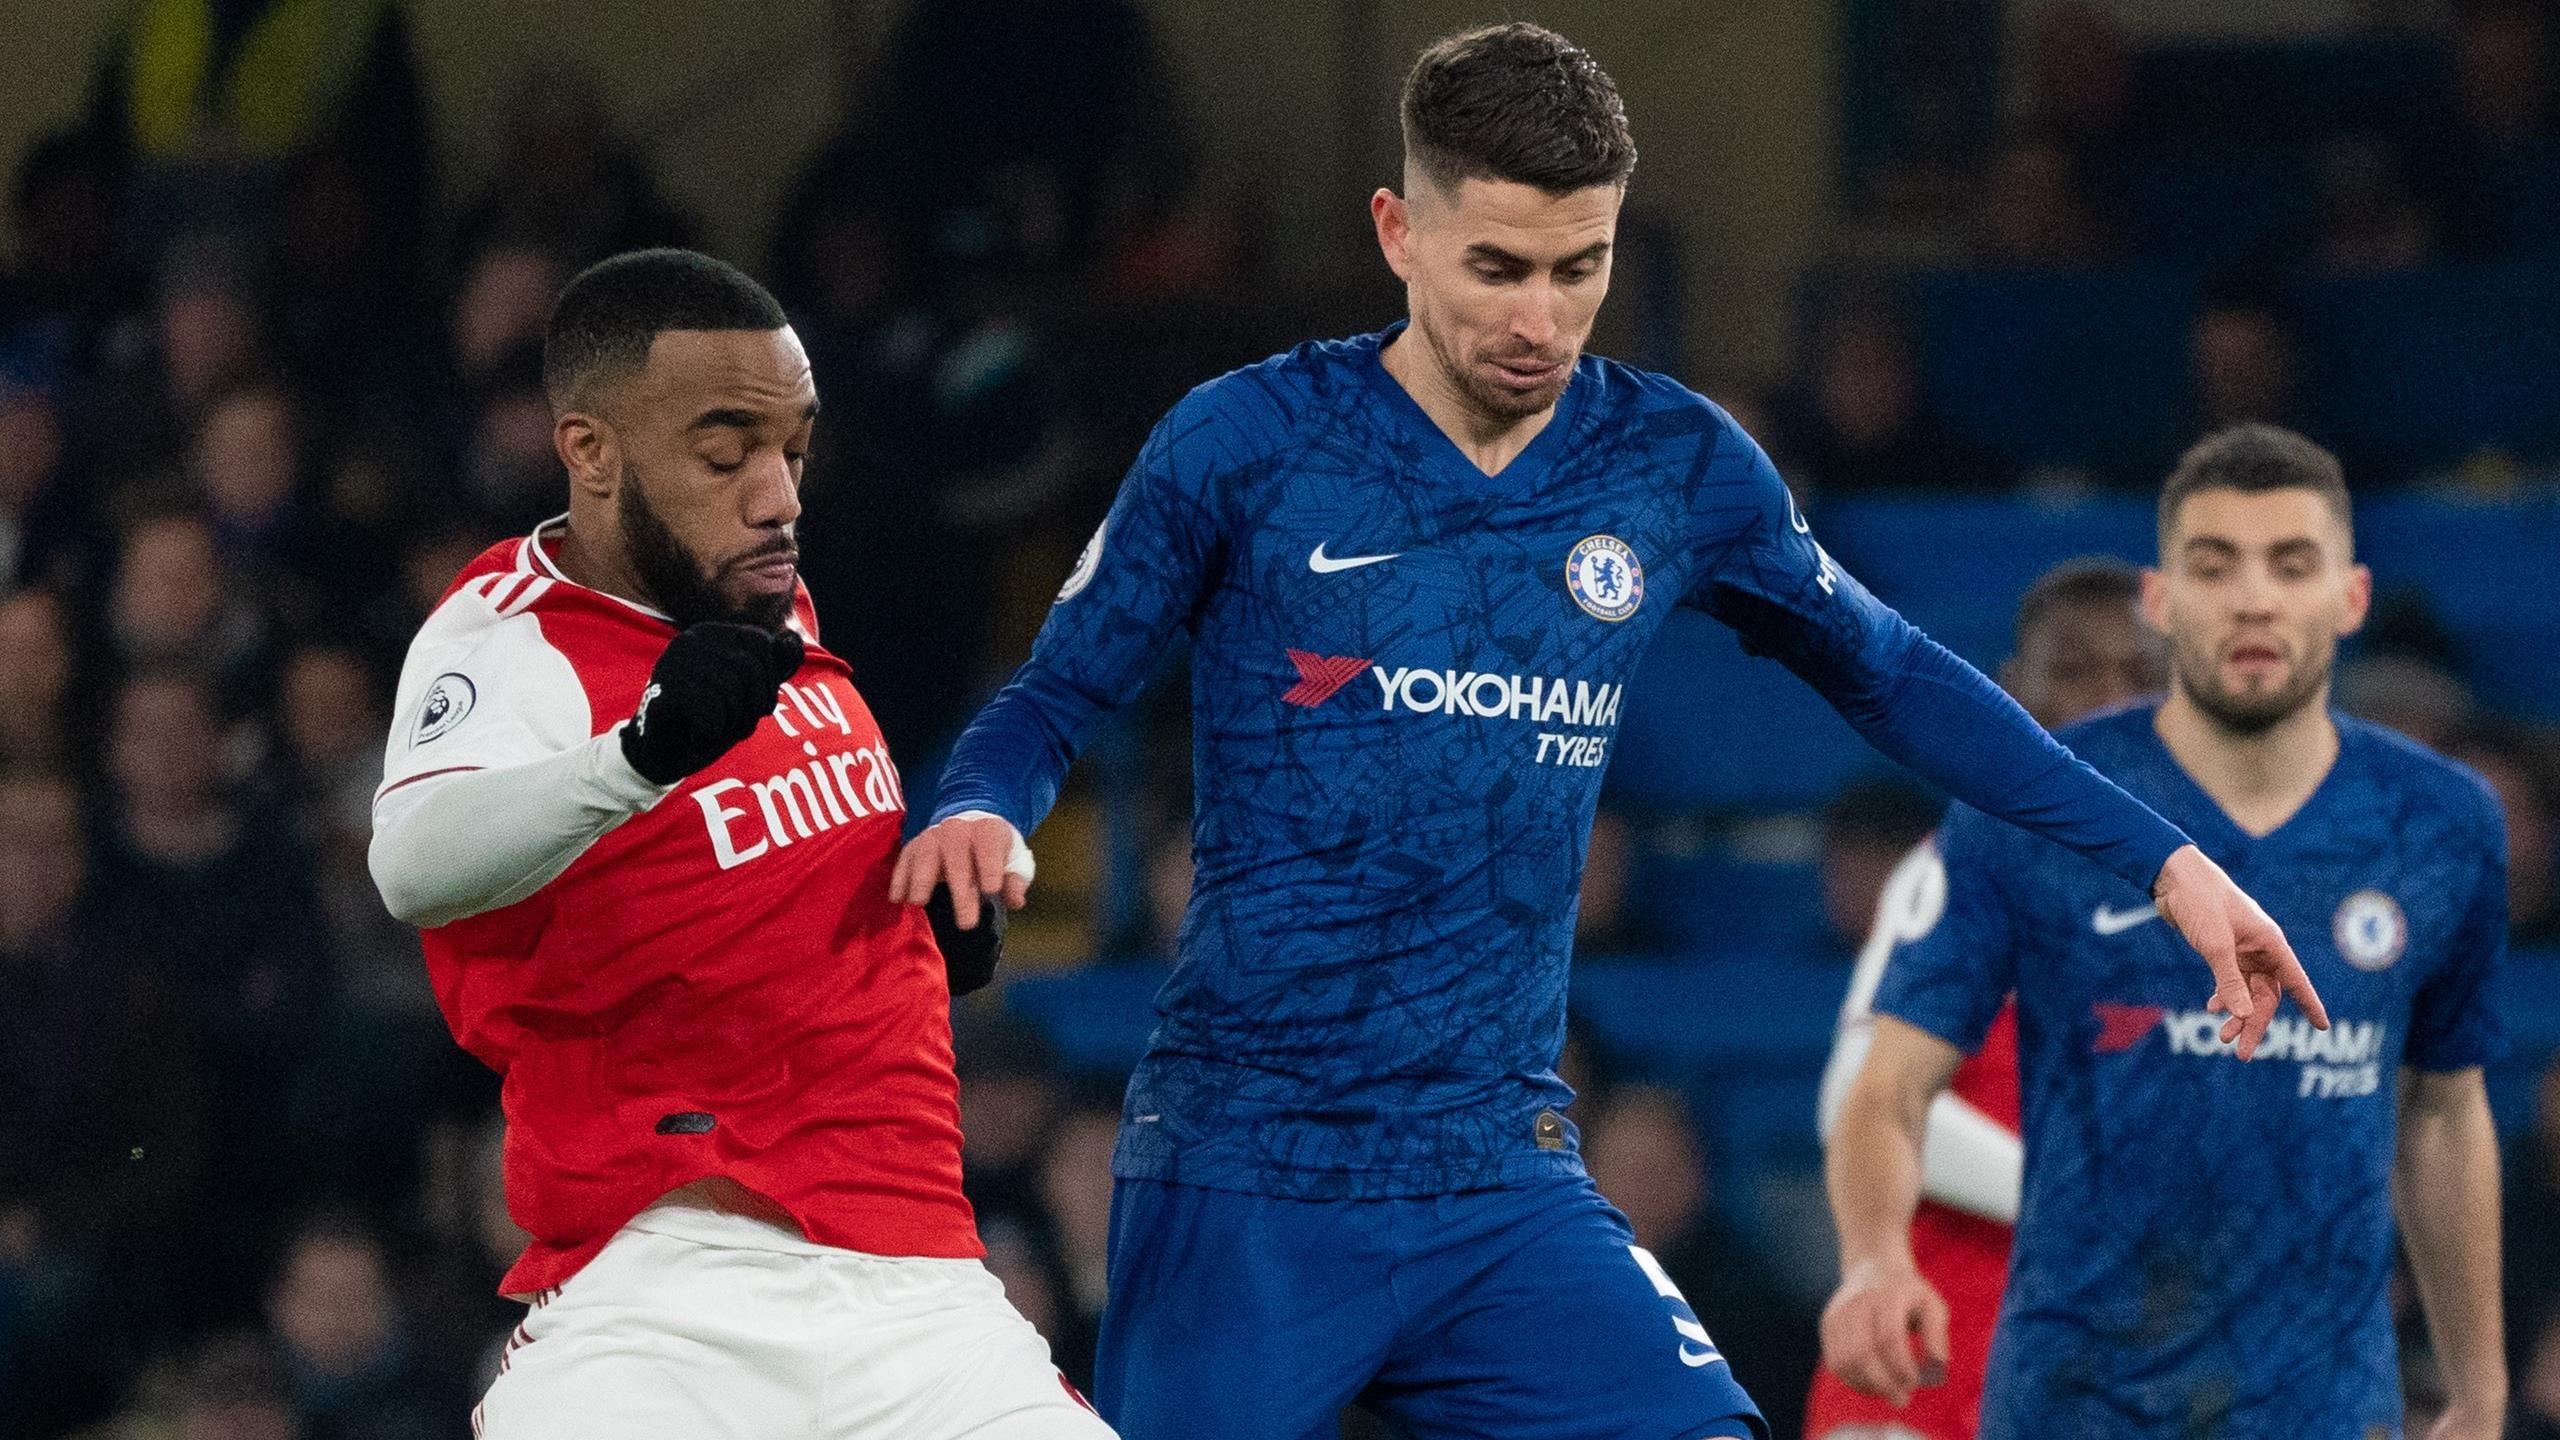 Premier League December Fixtures Arsenal Vs Chelsea Leicester Vs Manchester United On Boxing Day Eurosport